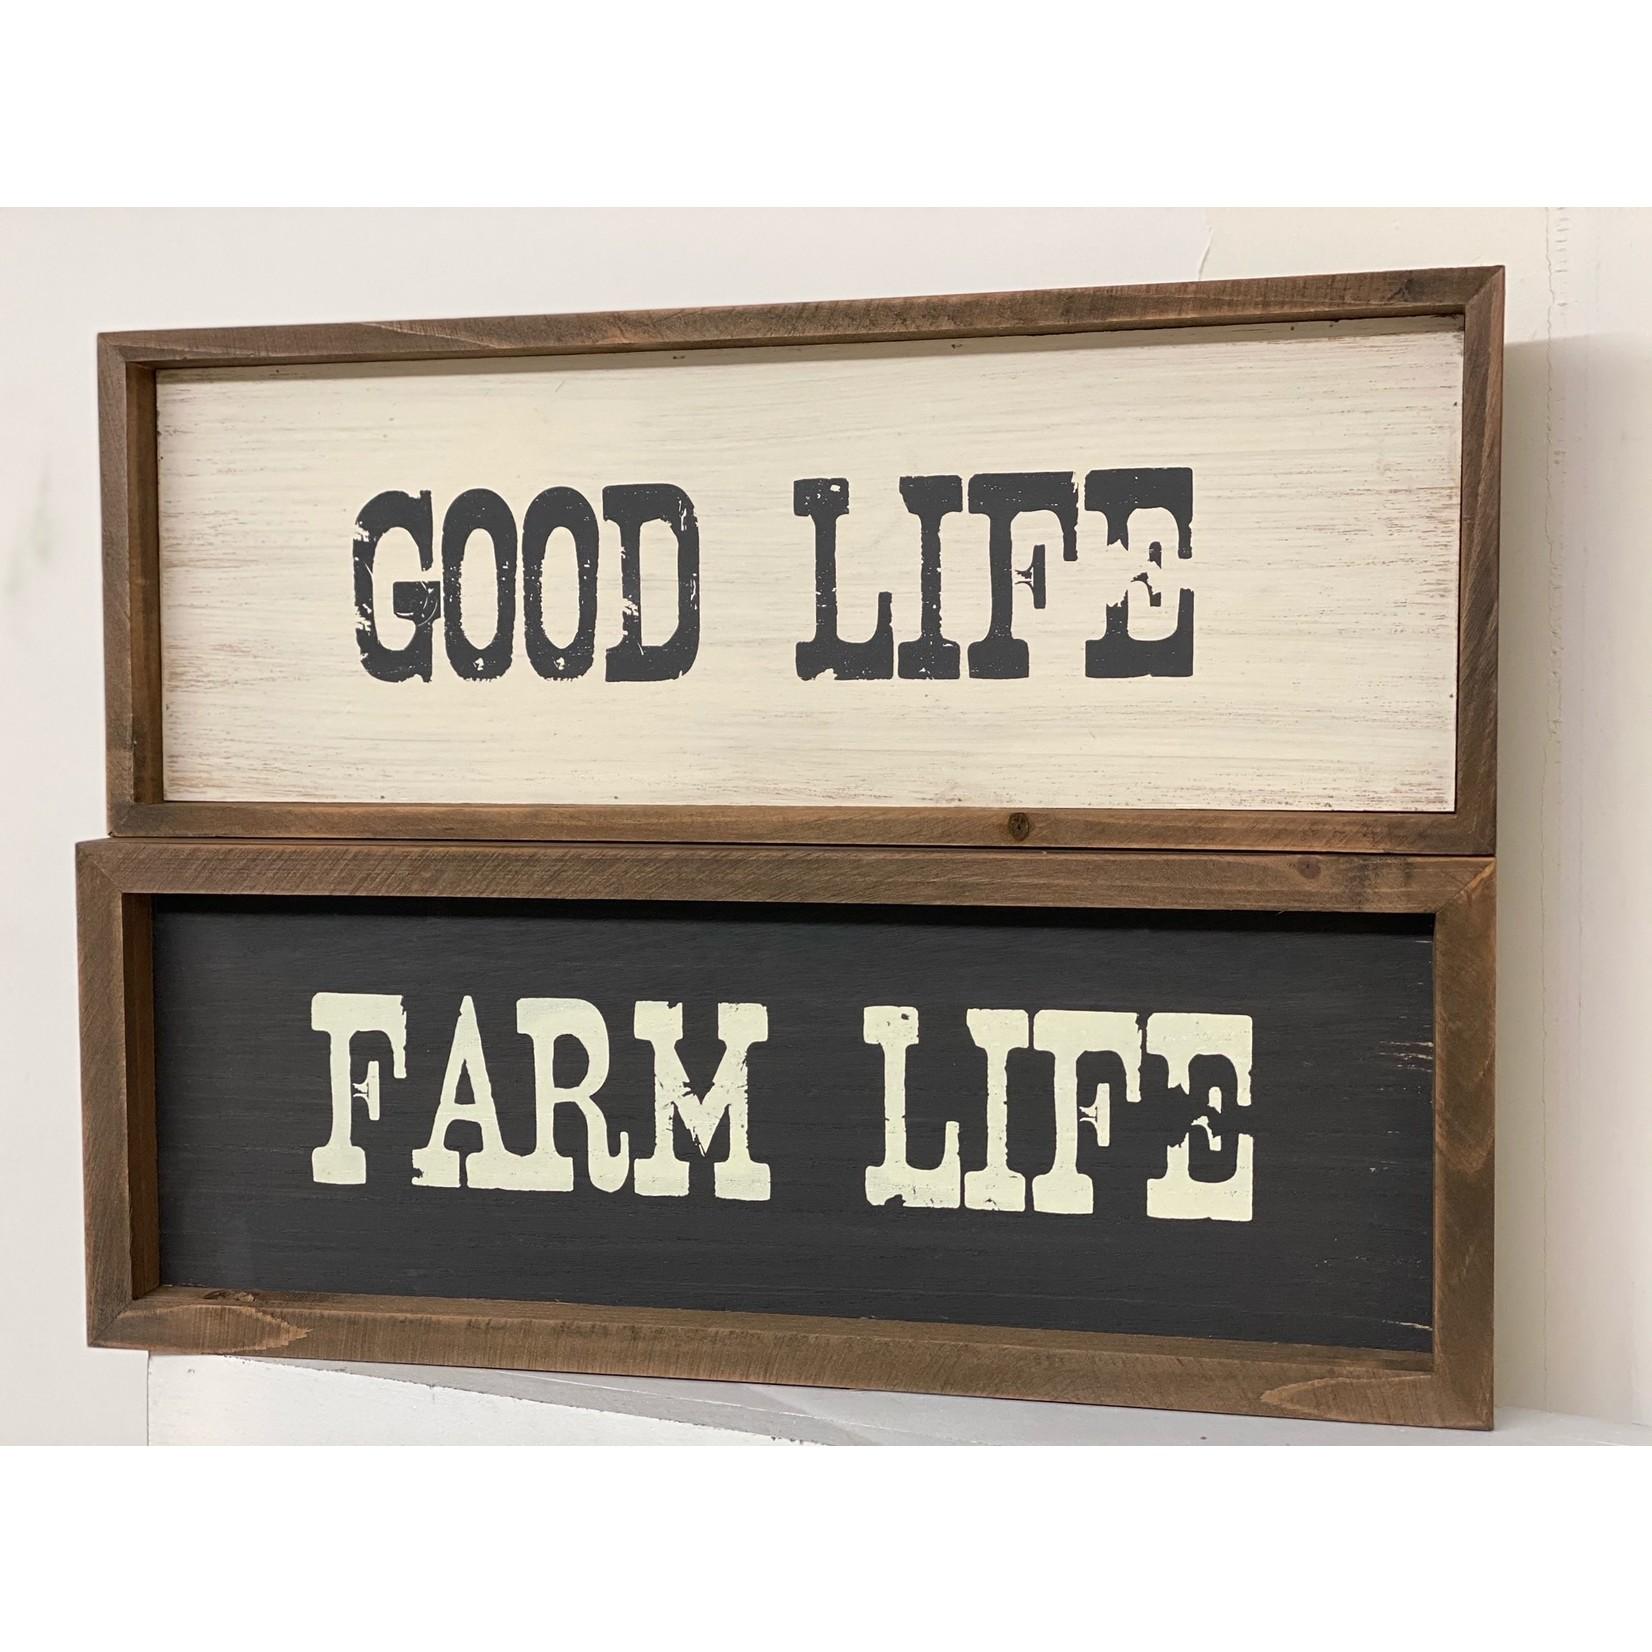 Farm Life/Good Life Two-Sided Ledge Sign